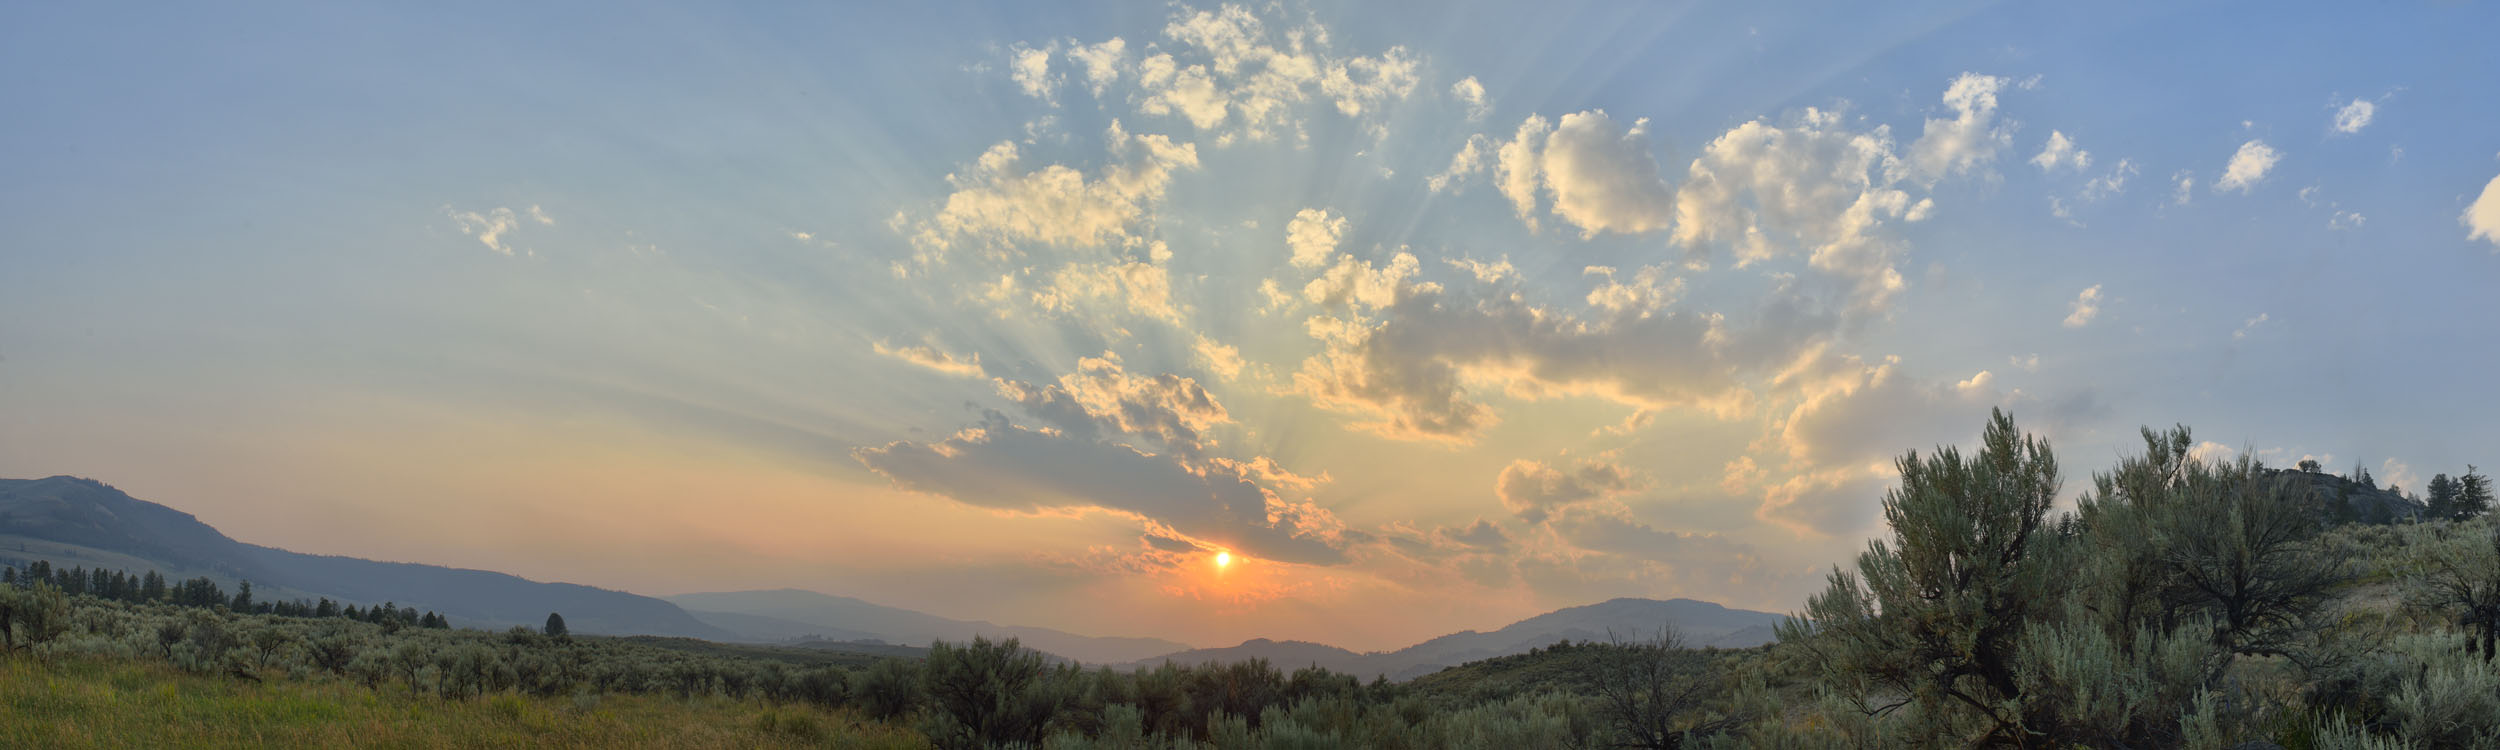 Sunset over the Washburns #1